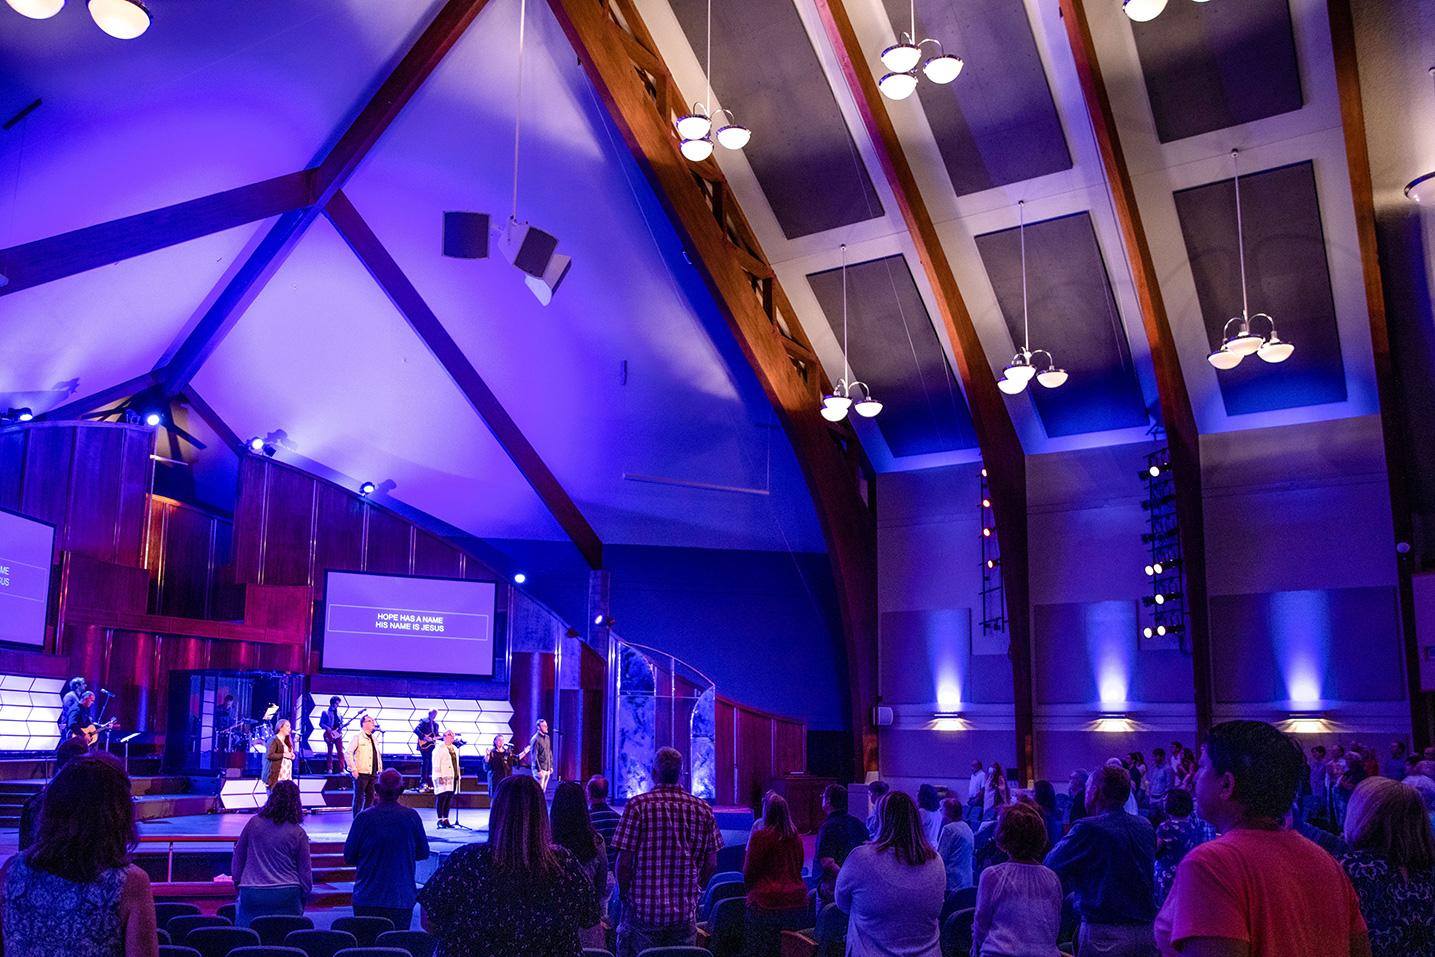 Church at the Crossing_0K1A2016-v2-sm